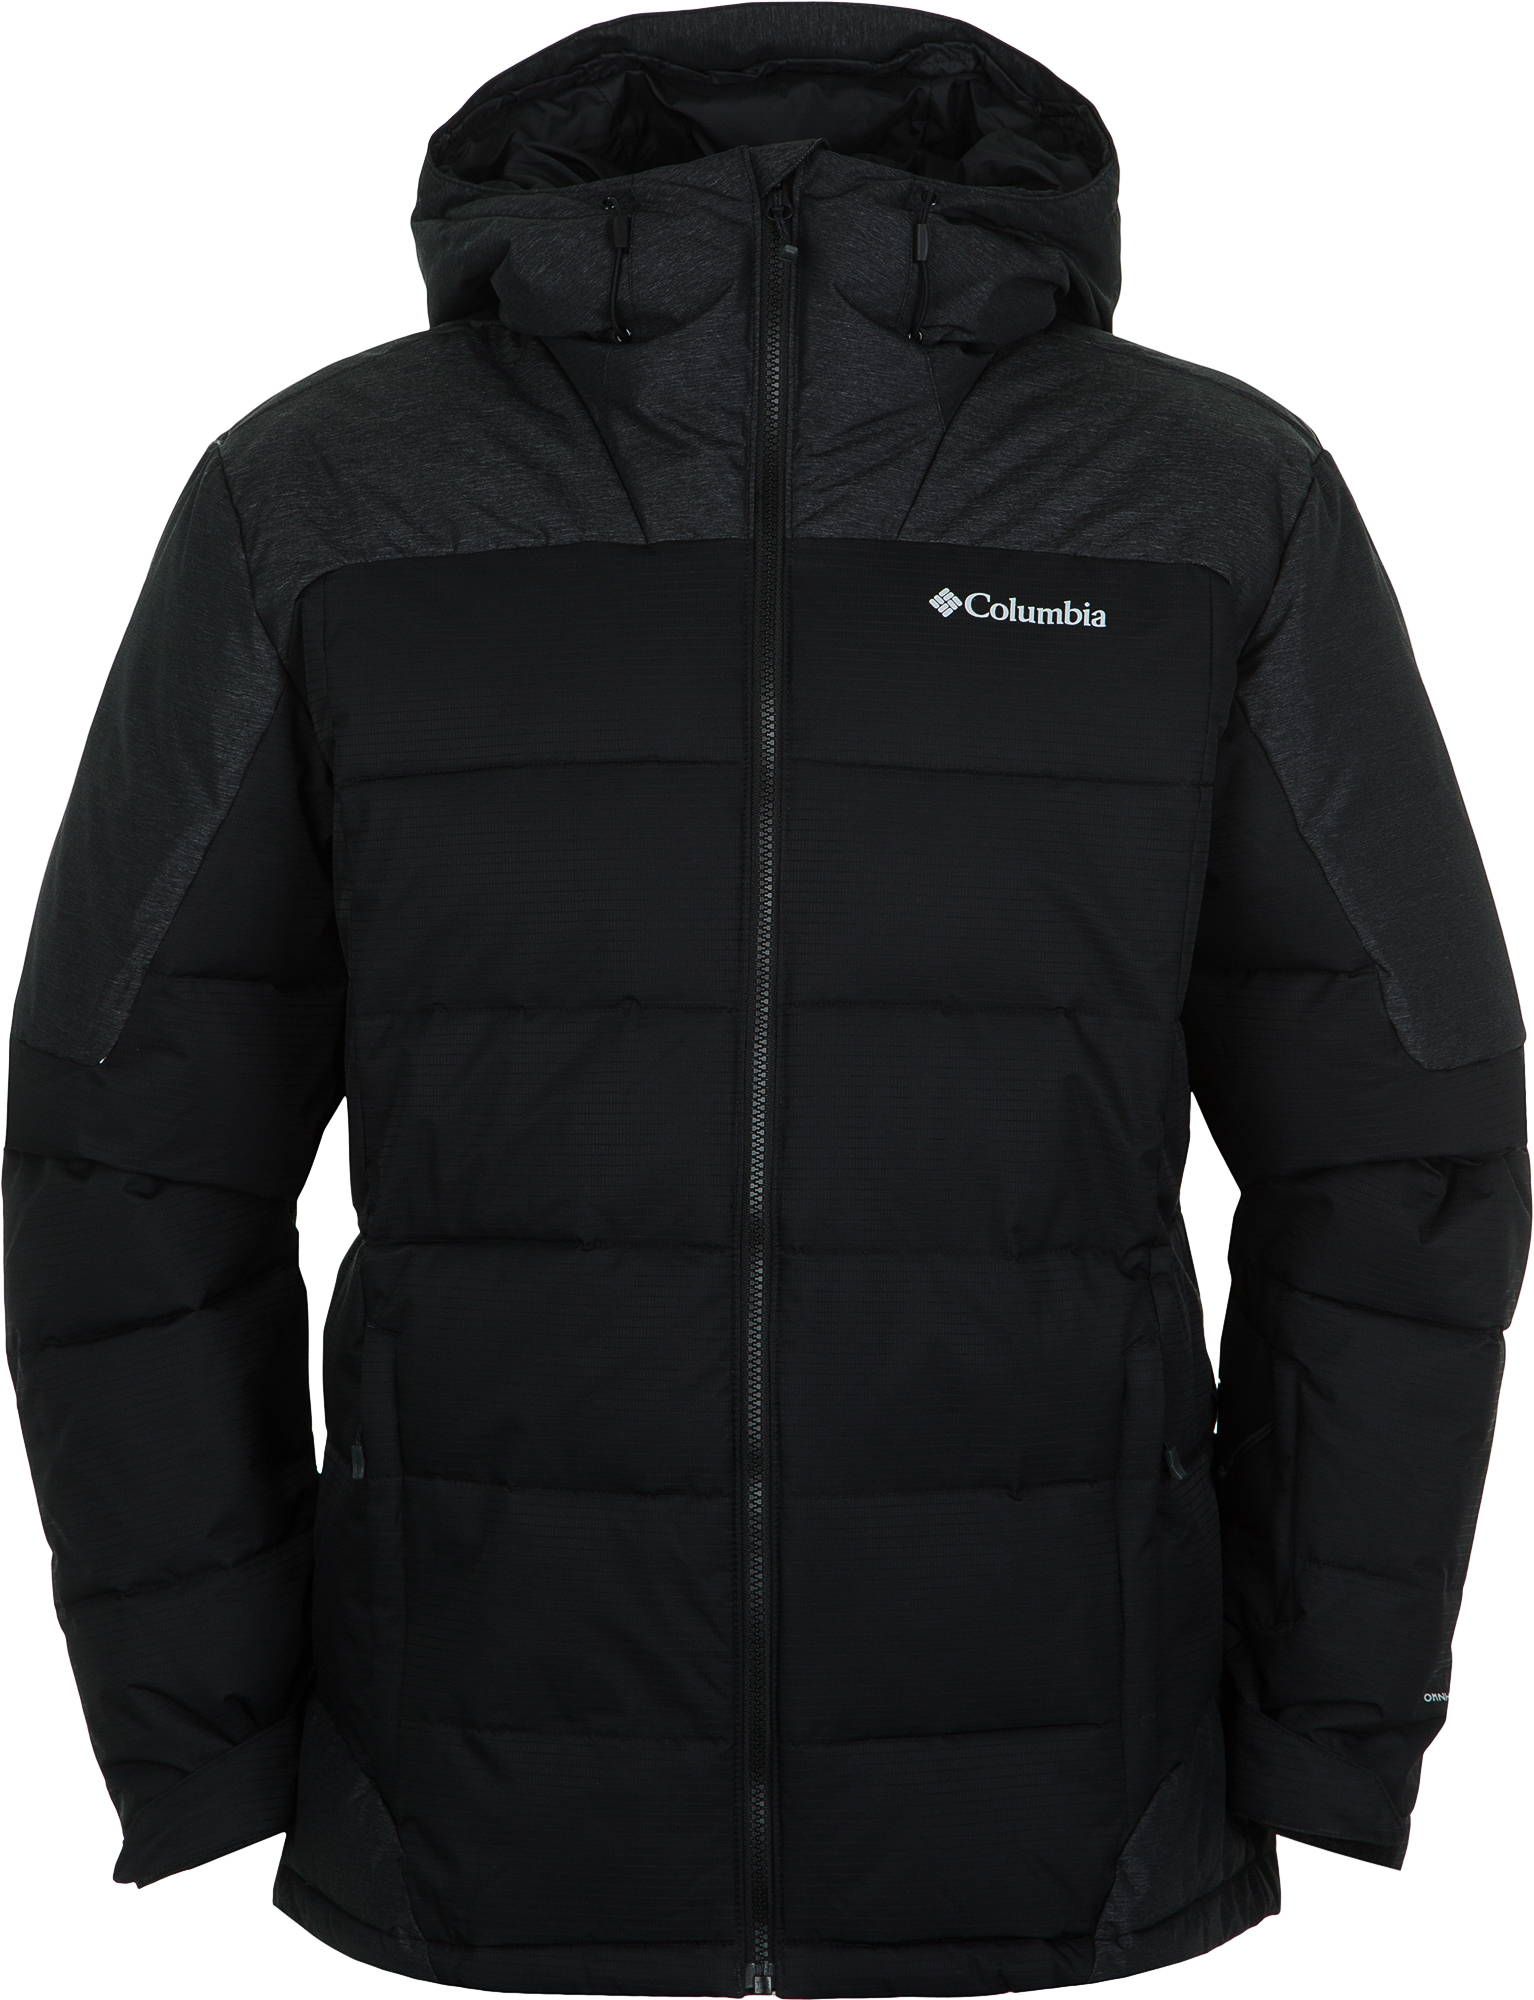 Columbia Куртка утепленная мужская Columbia Woolly Hollow II, размер 46 columbia куртка утепленная мужская columbia eagles call